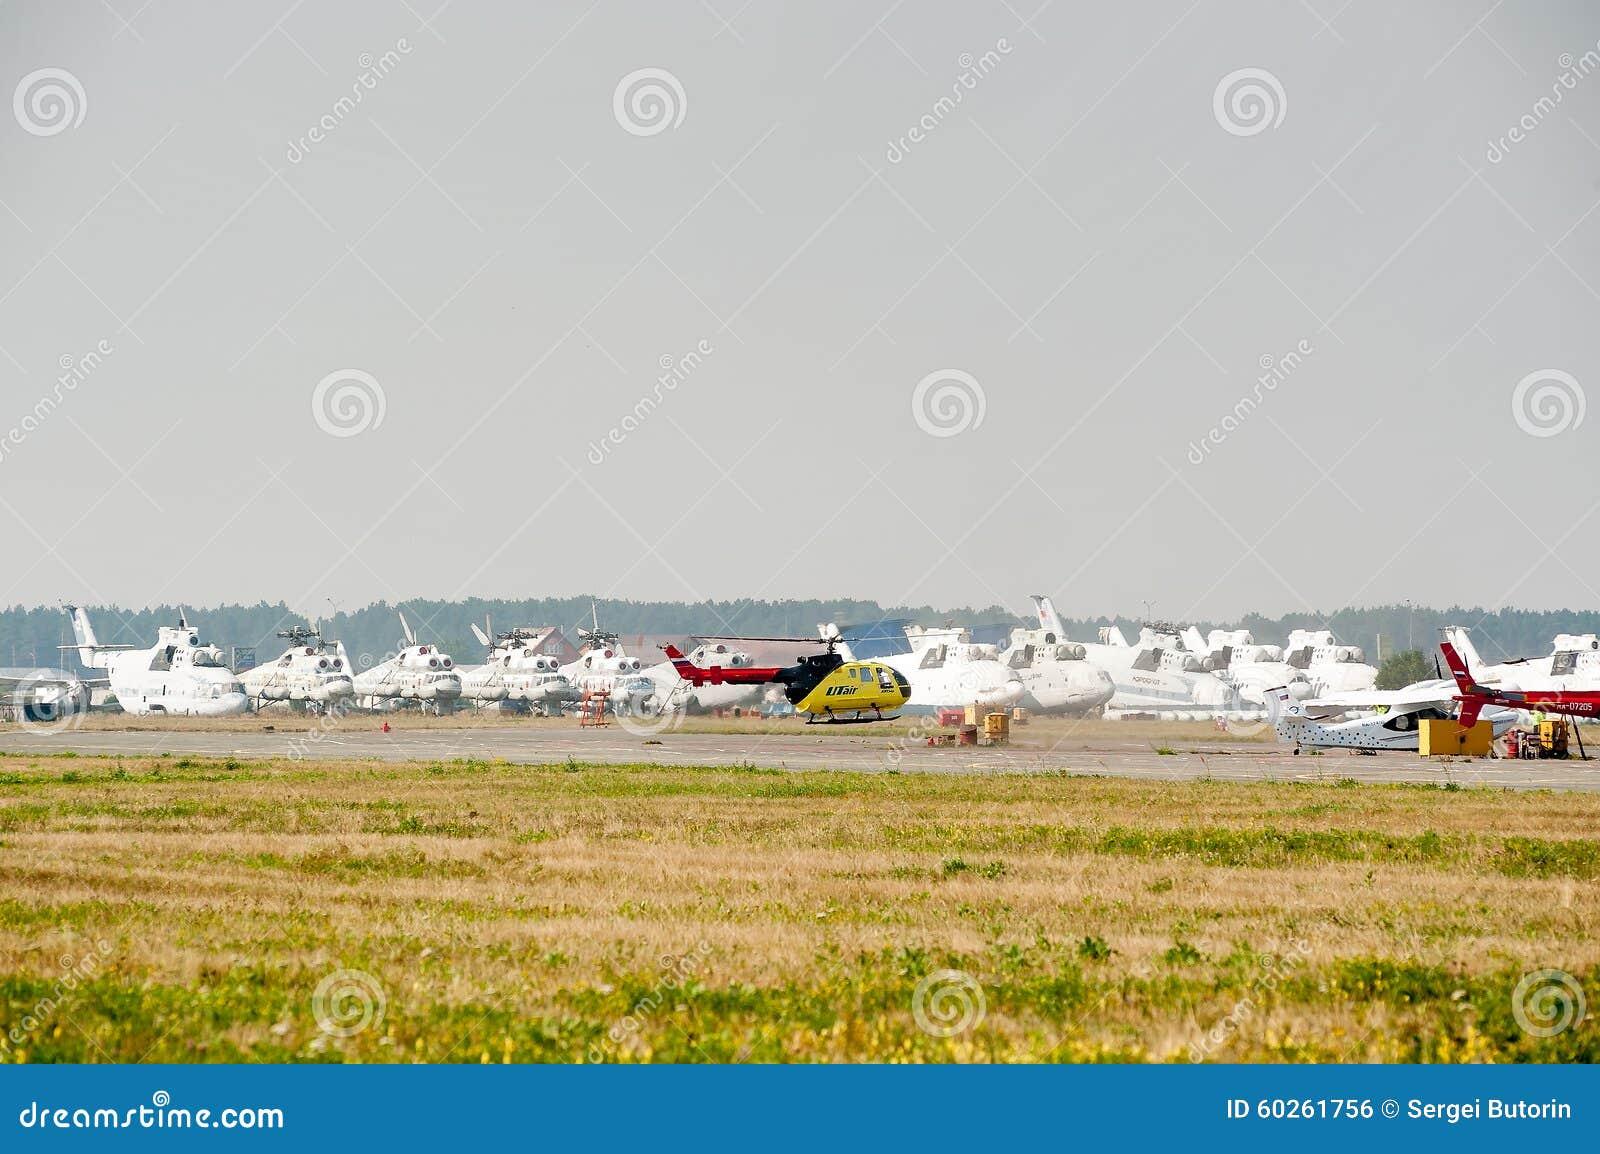 Elicottero 350 : Eurocopter as 350 sopra i vecchi elicotteri mi 26 fotografia